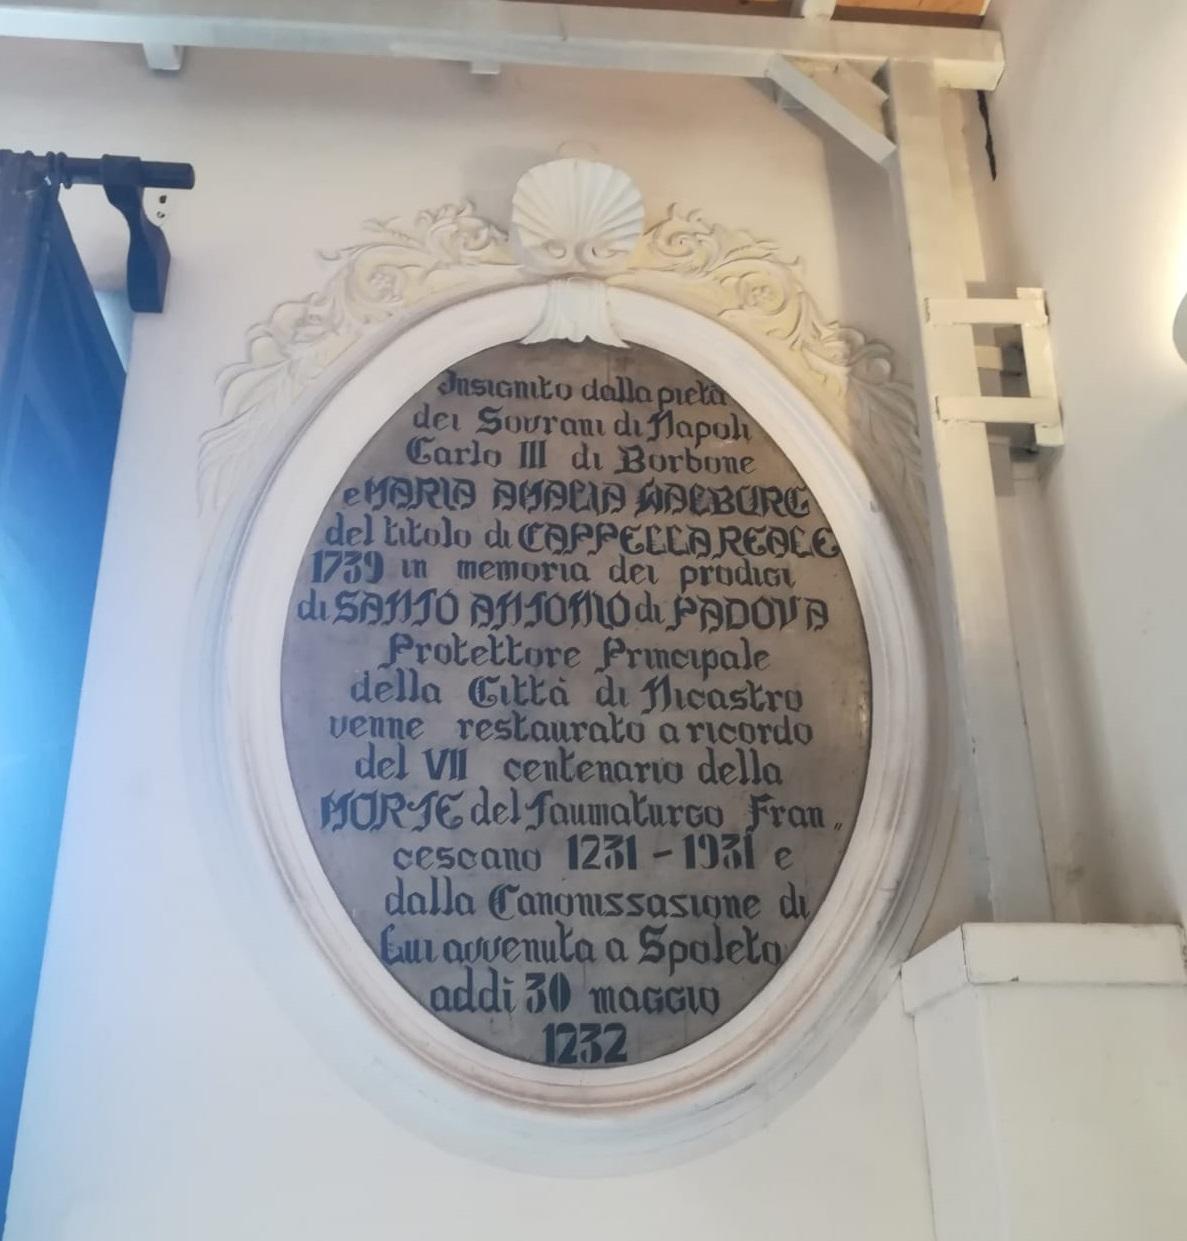 Sant'antonio Insegne Reali